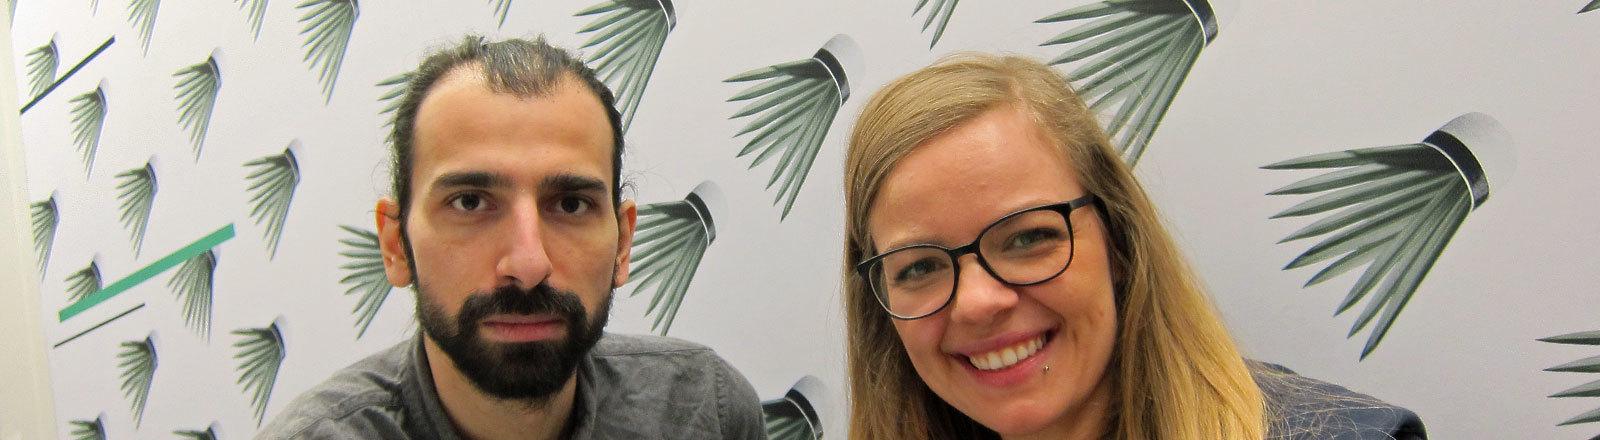 Autor und Filmemacher Rami Hamze neben Moderatorin Jenni Gärtner.